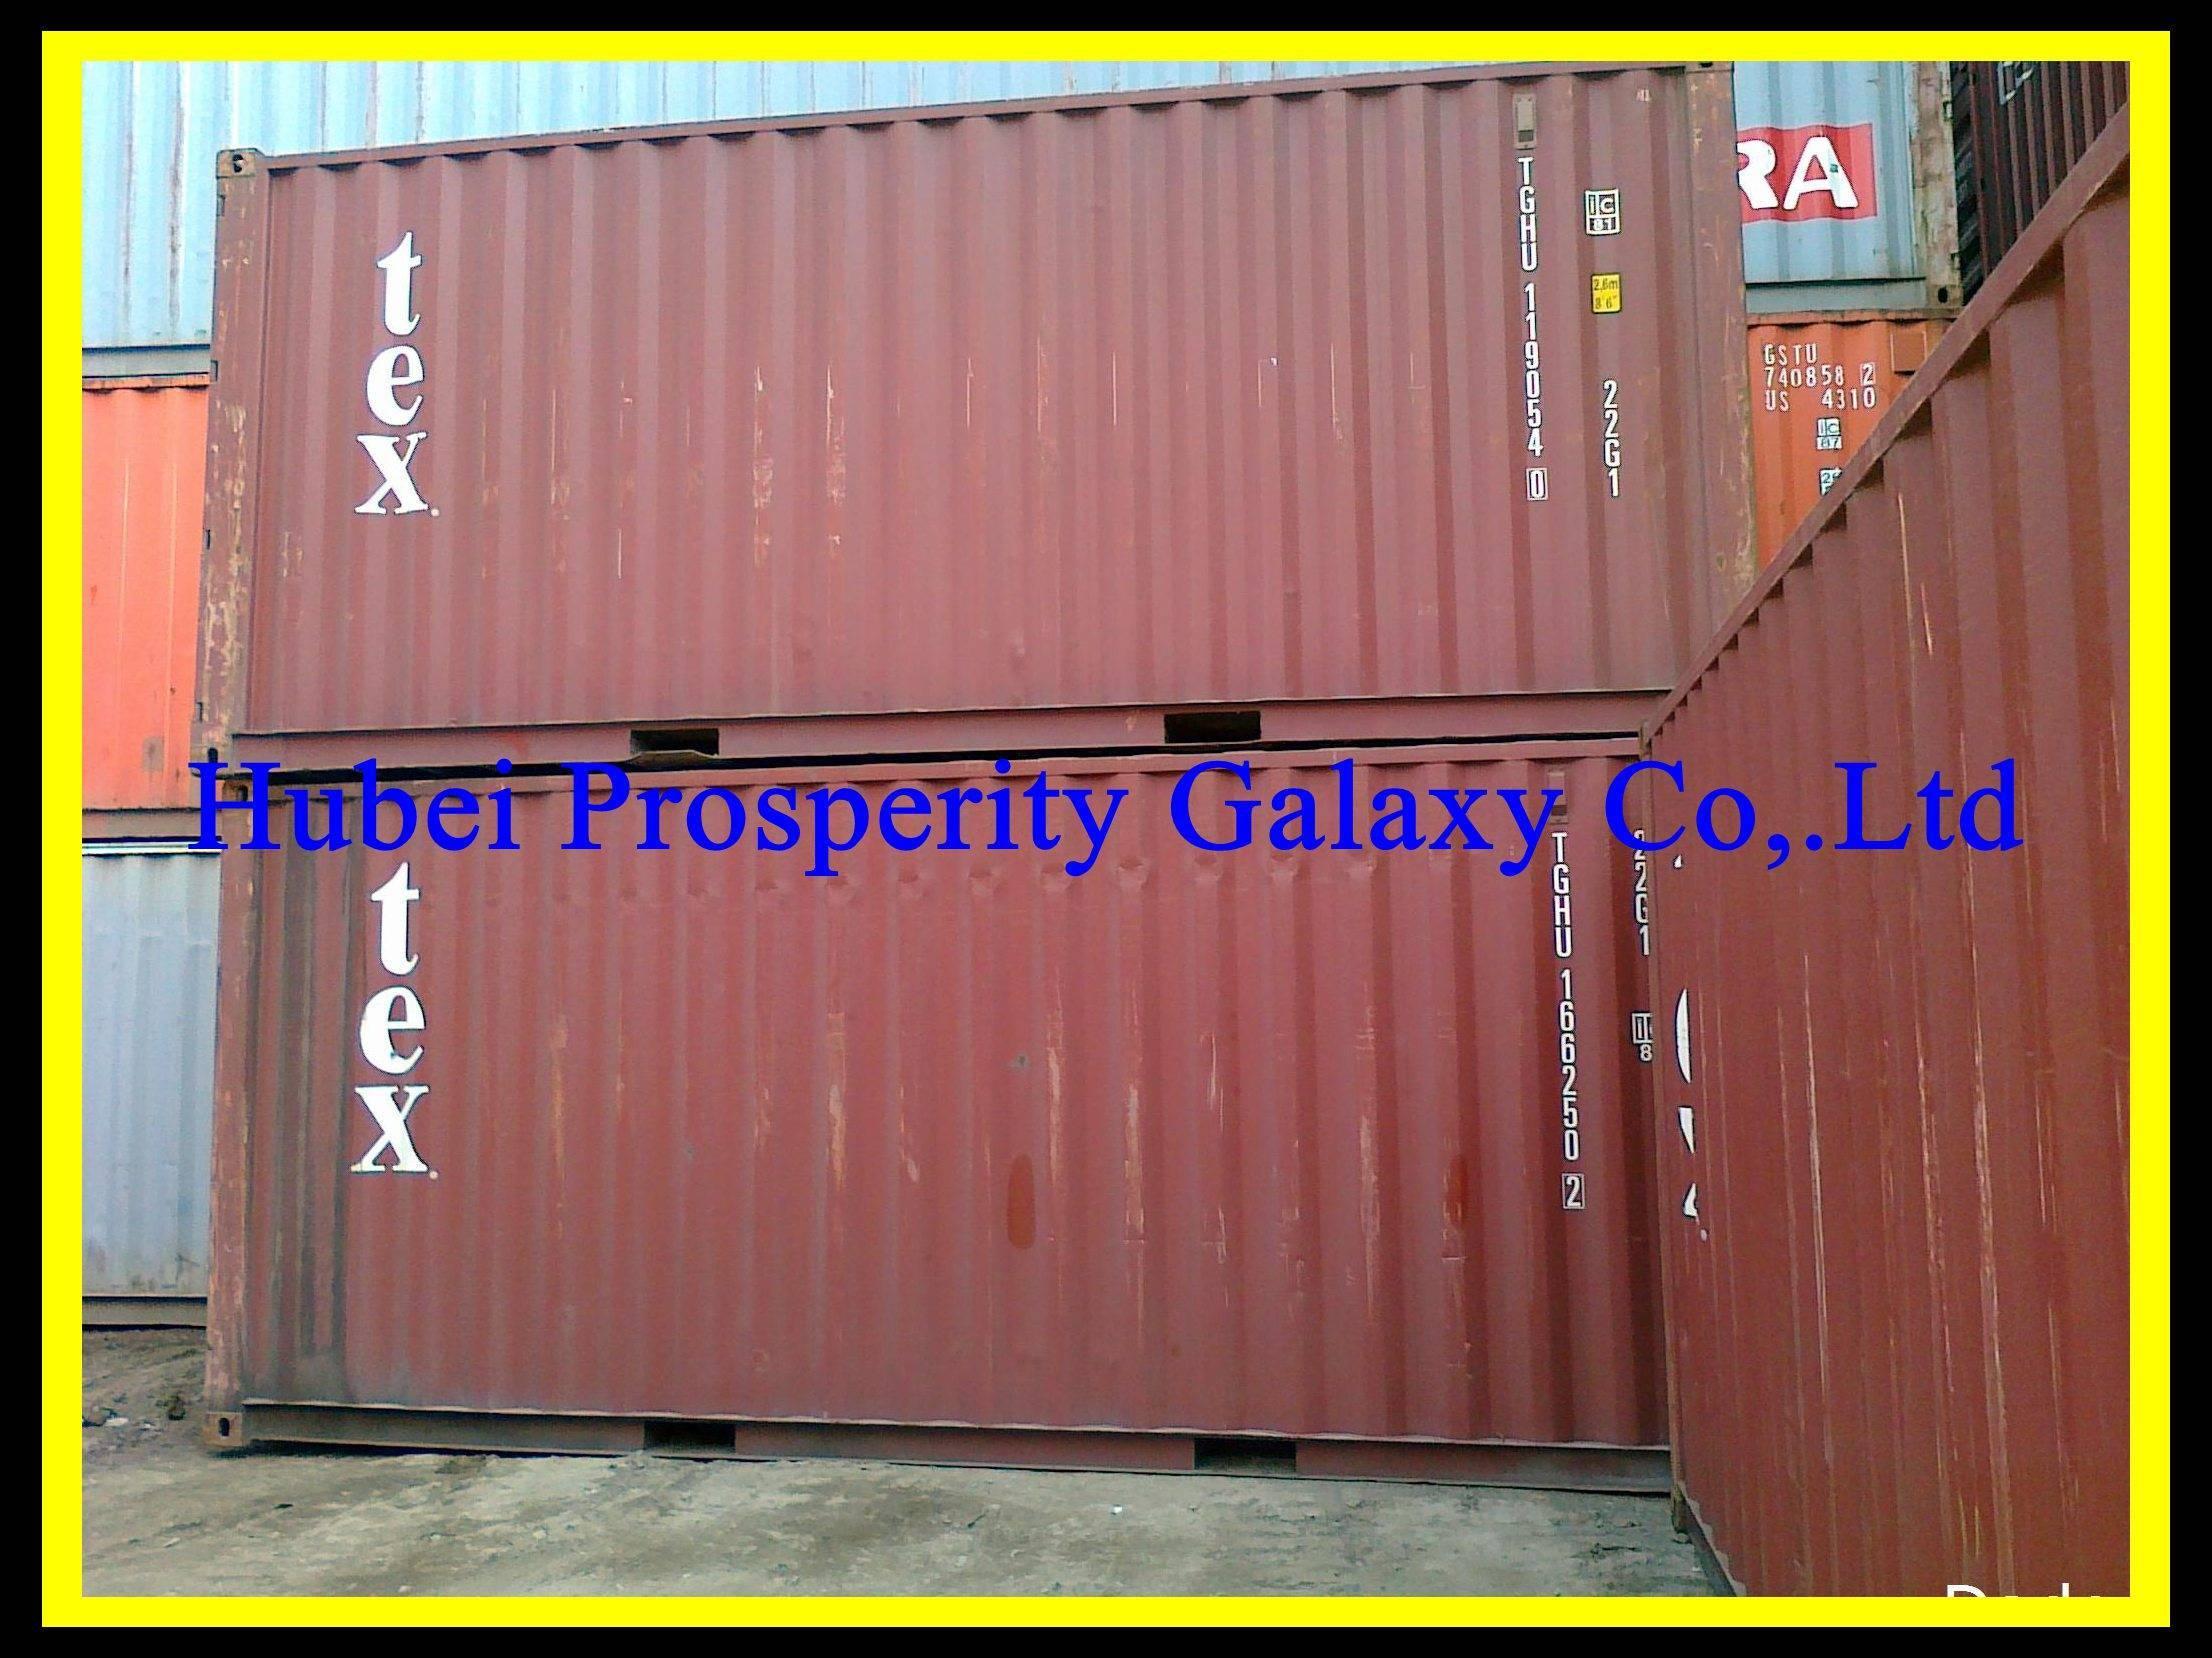 Propylene carbonate CAS 108-32-7 Industry grade 99.99% assay